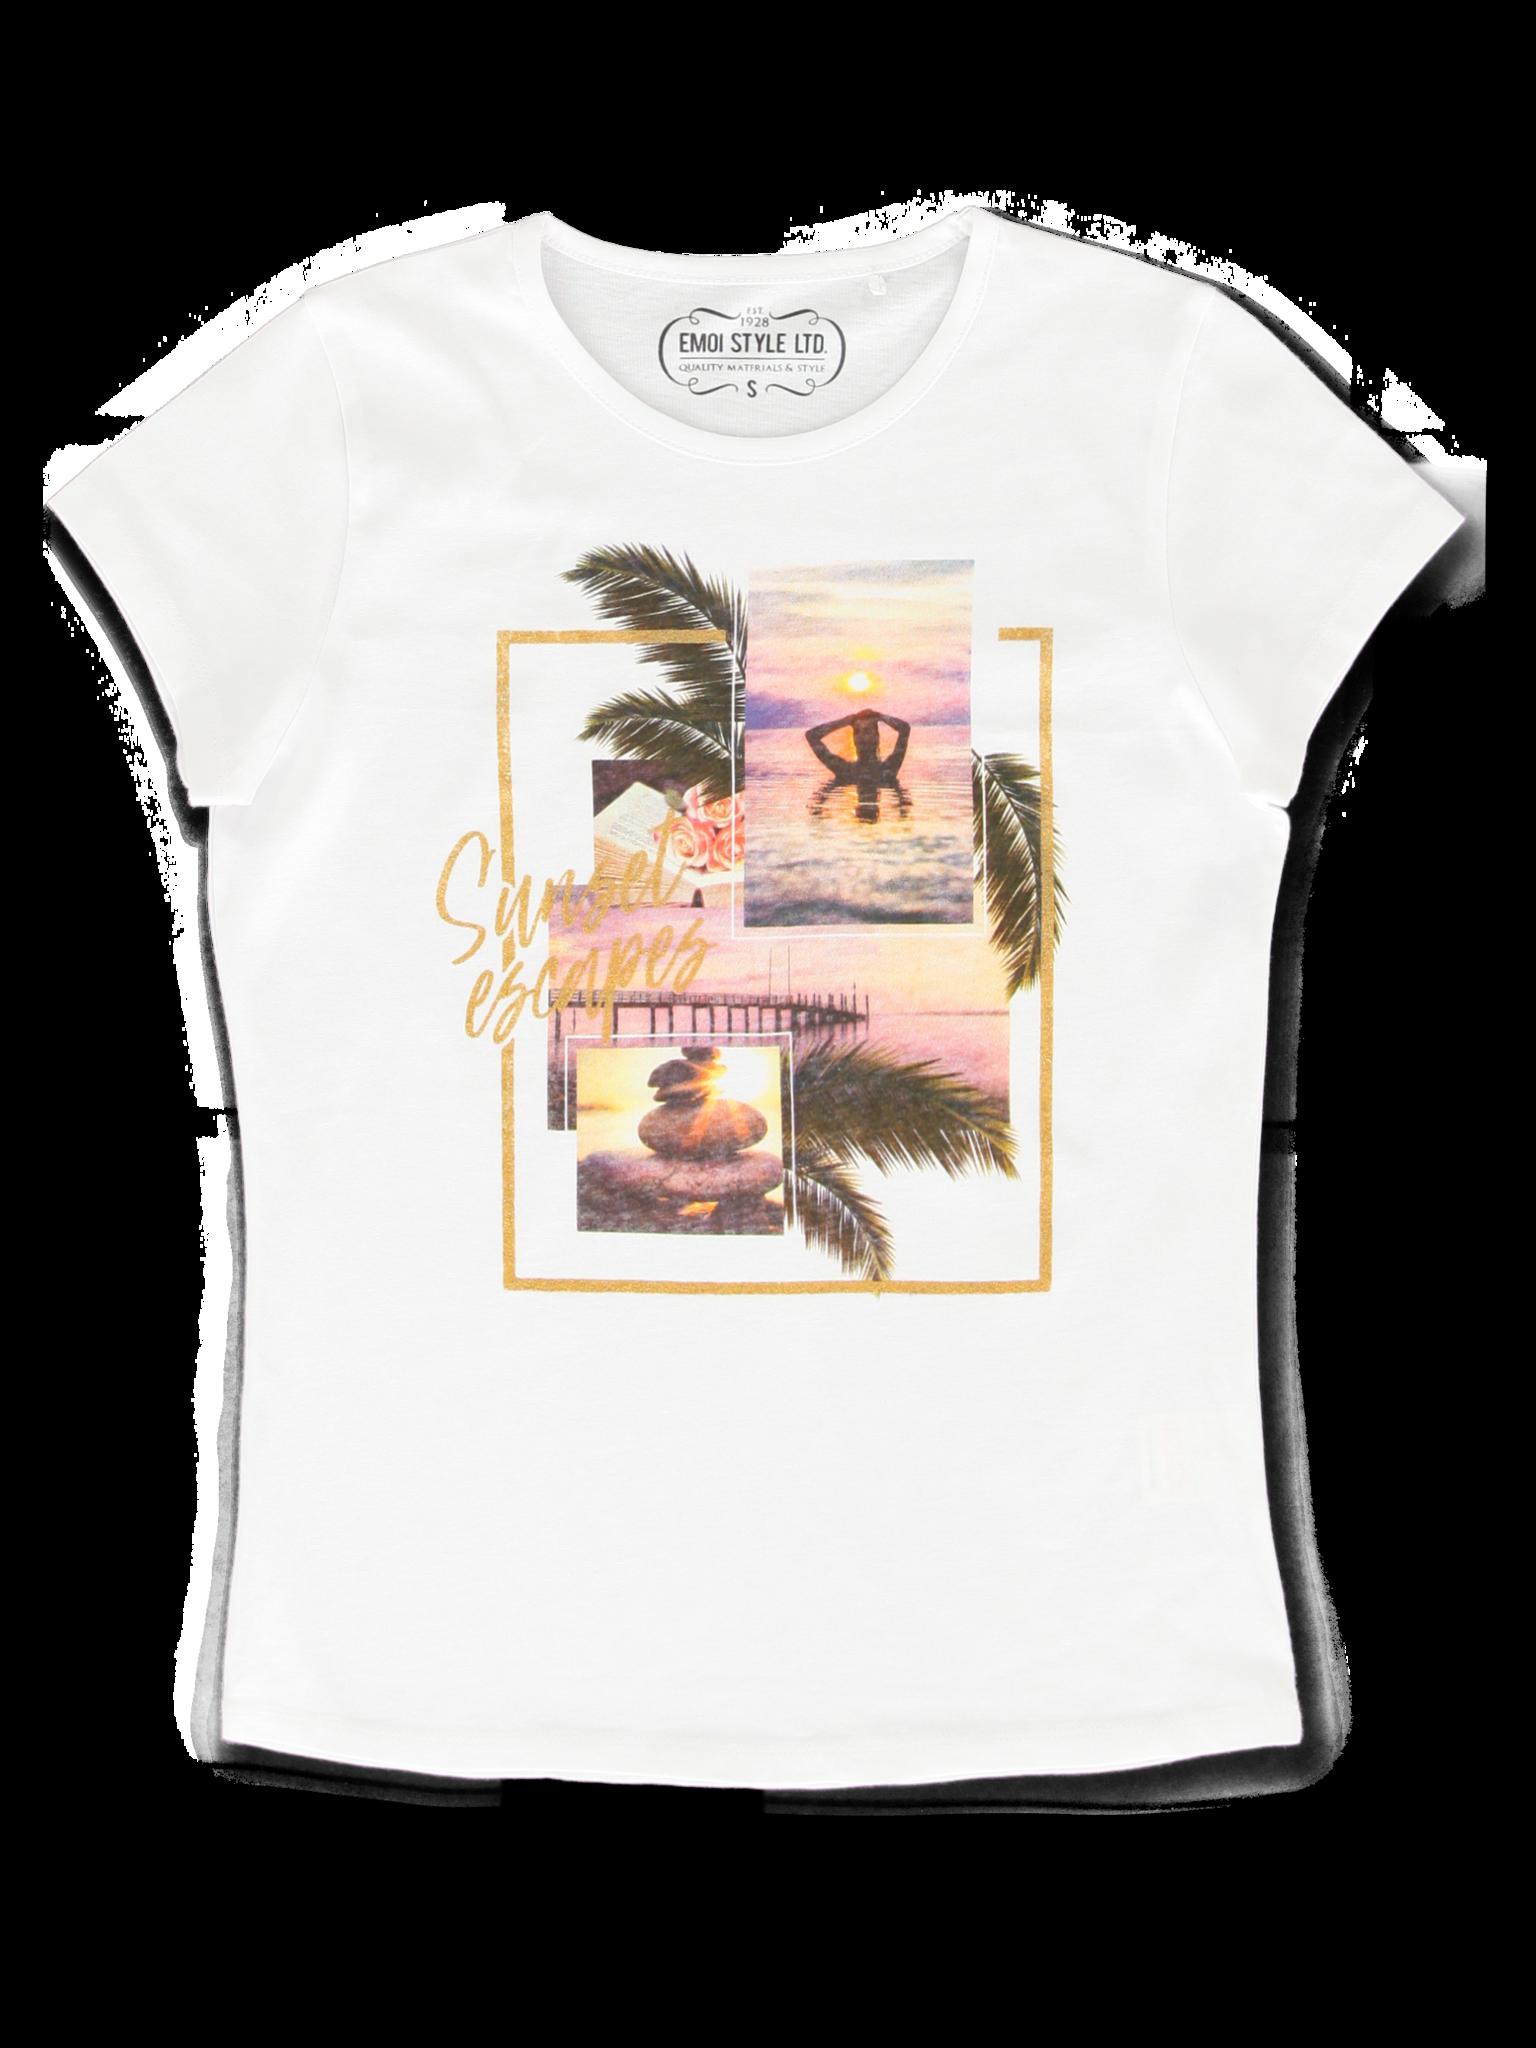 All Brands | Summerproducts Ladies | T-shirt | 24 pcs/box